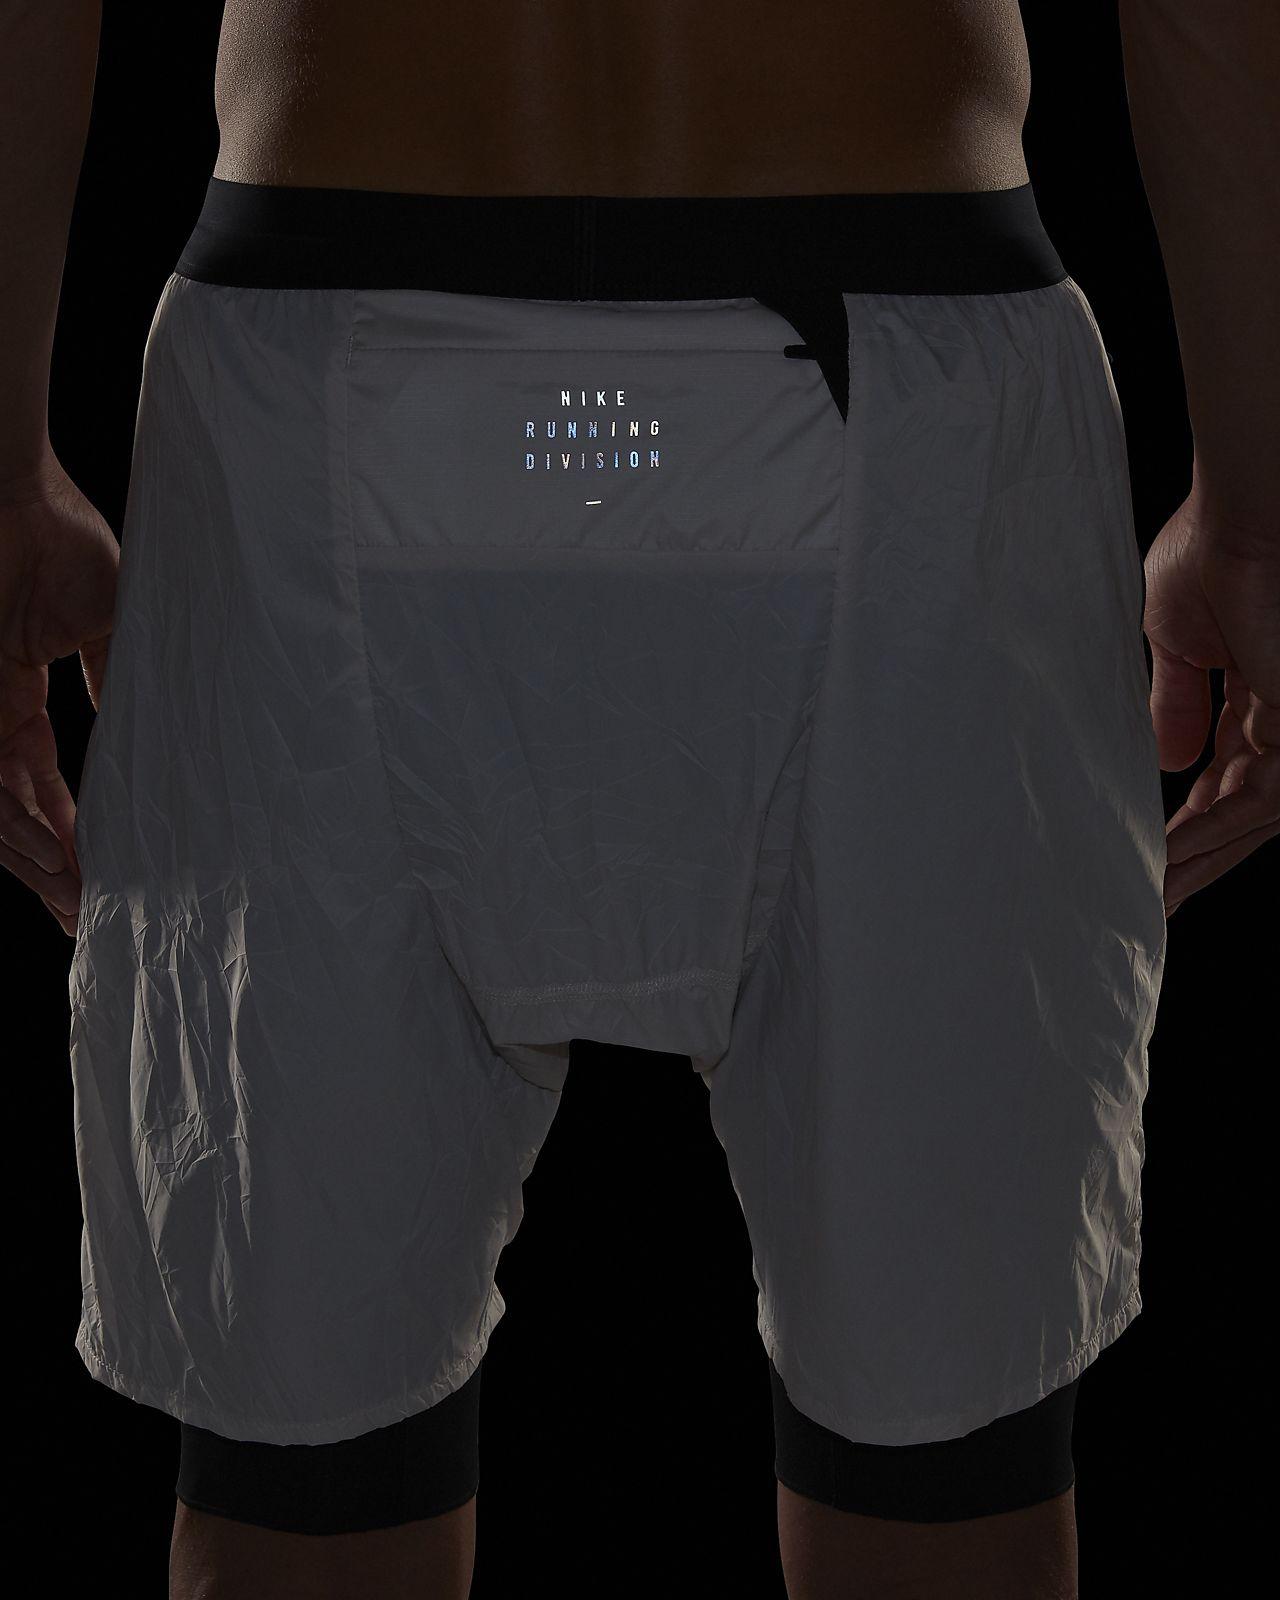 1a7fb181b6b1 Nike Flex Run Division Stride Elevate Men s 2-in-1 Running Shorts ...